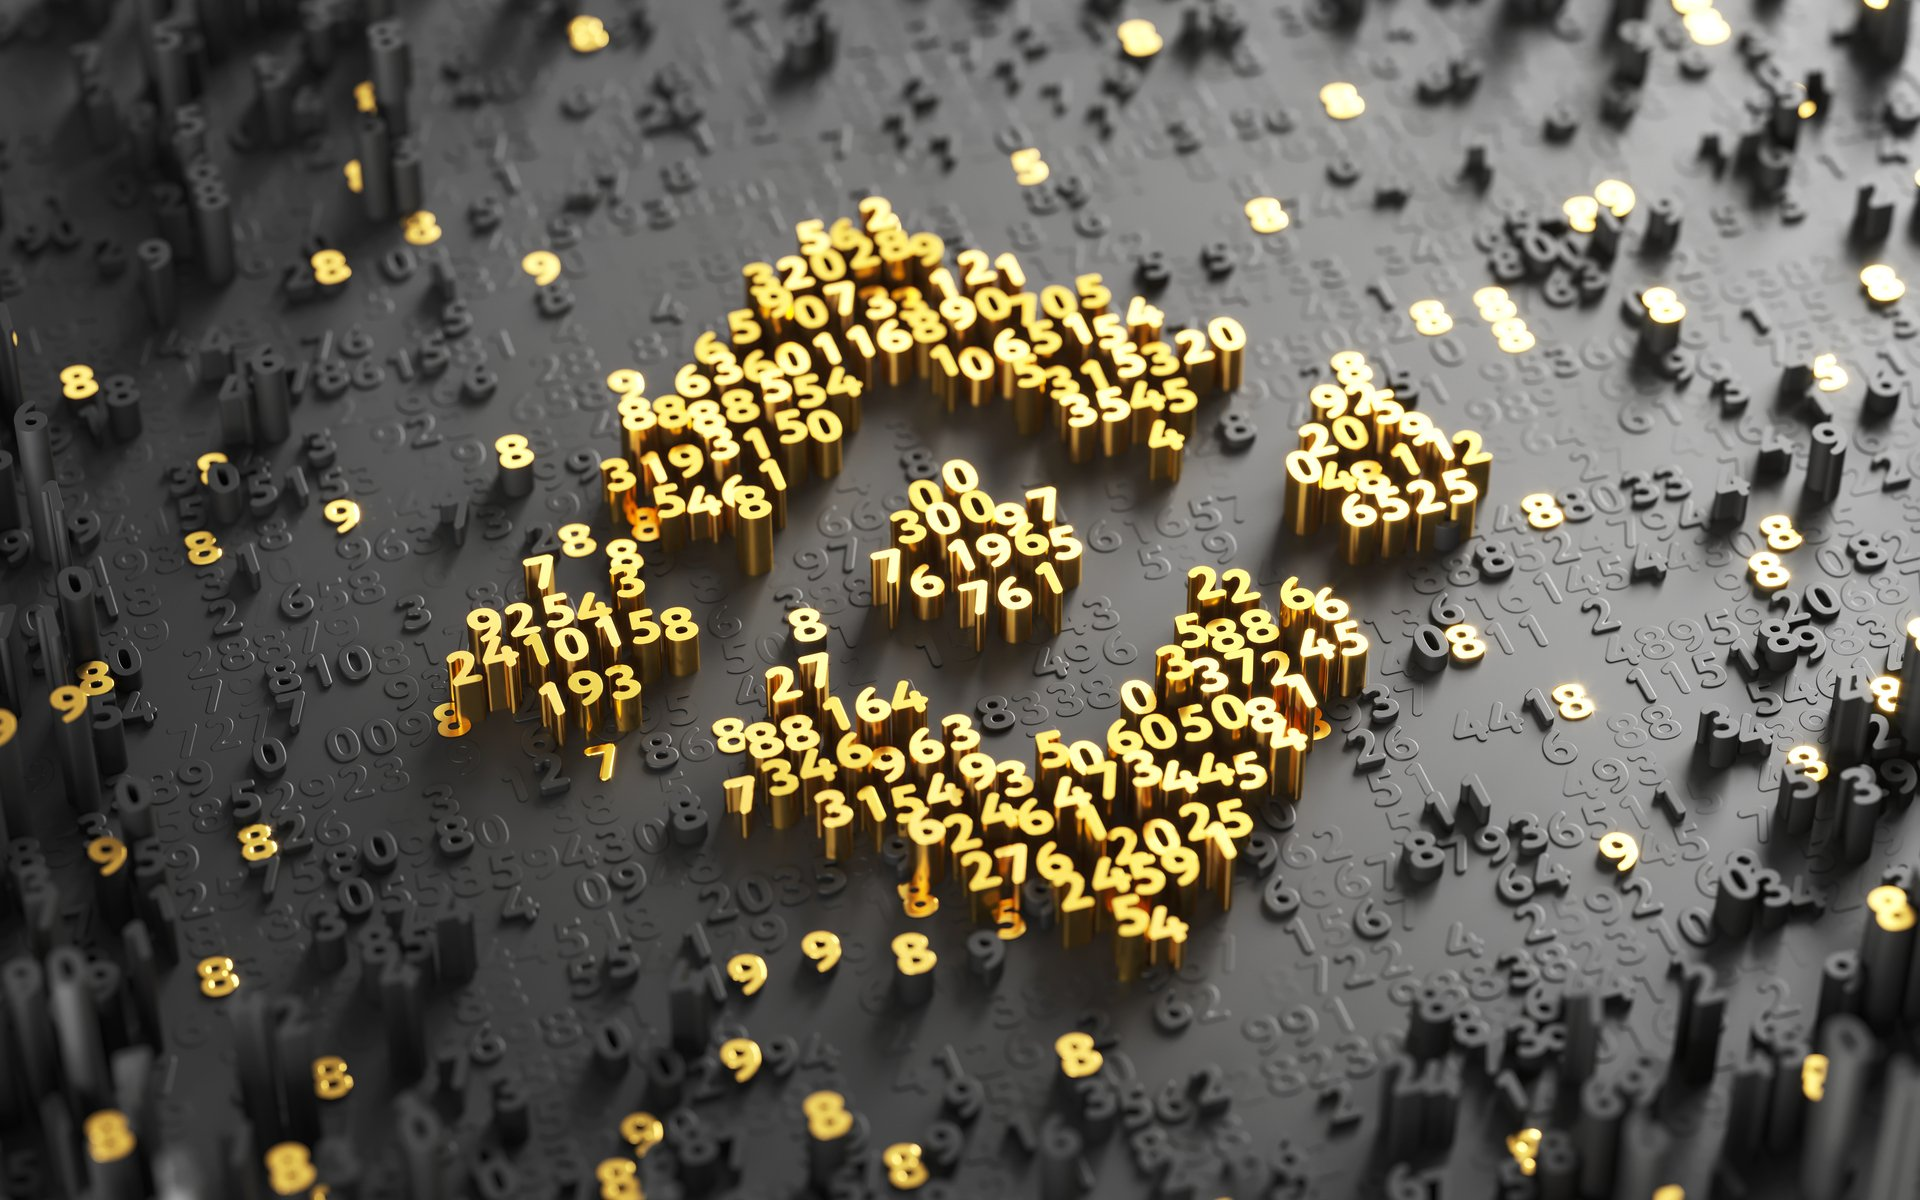 Binance developing its own public blockchain